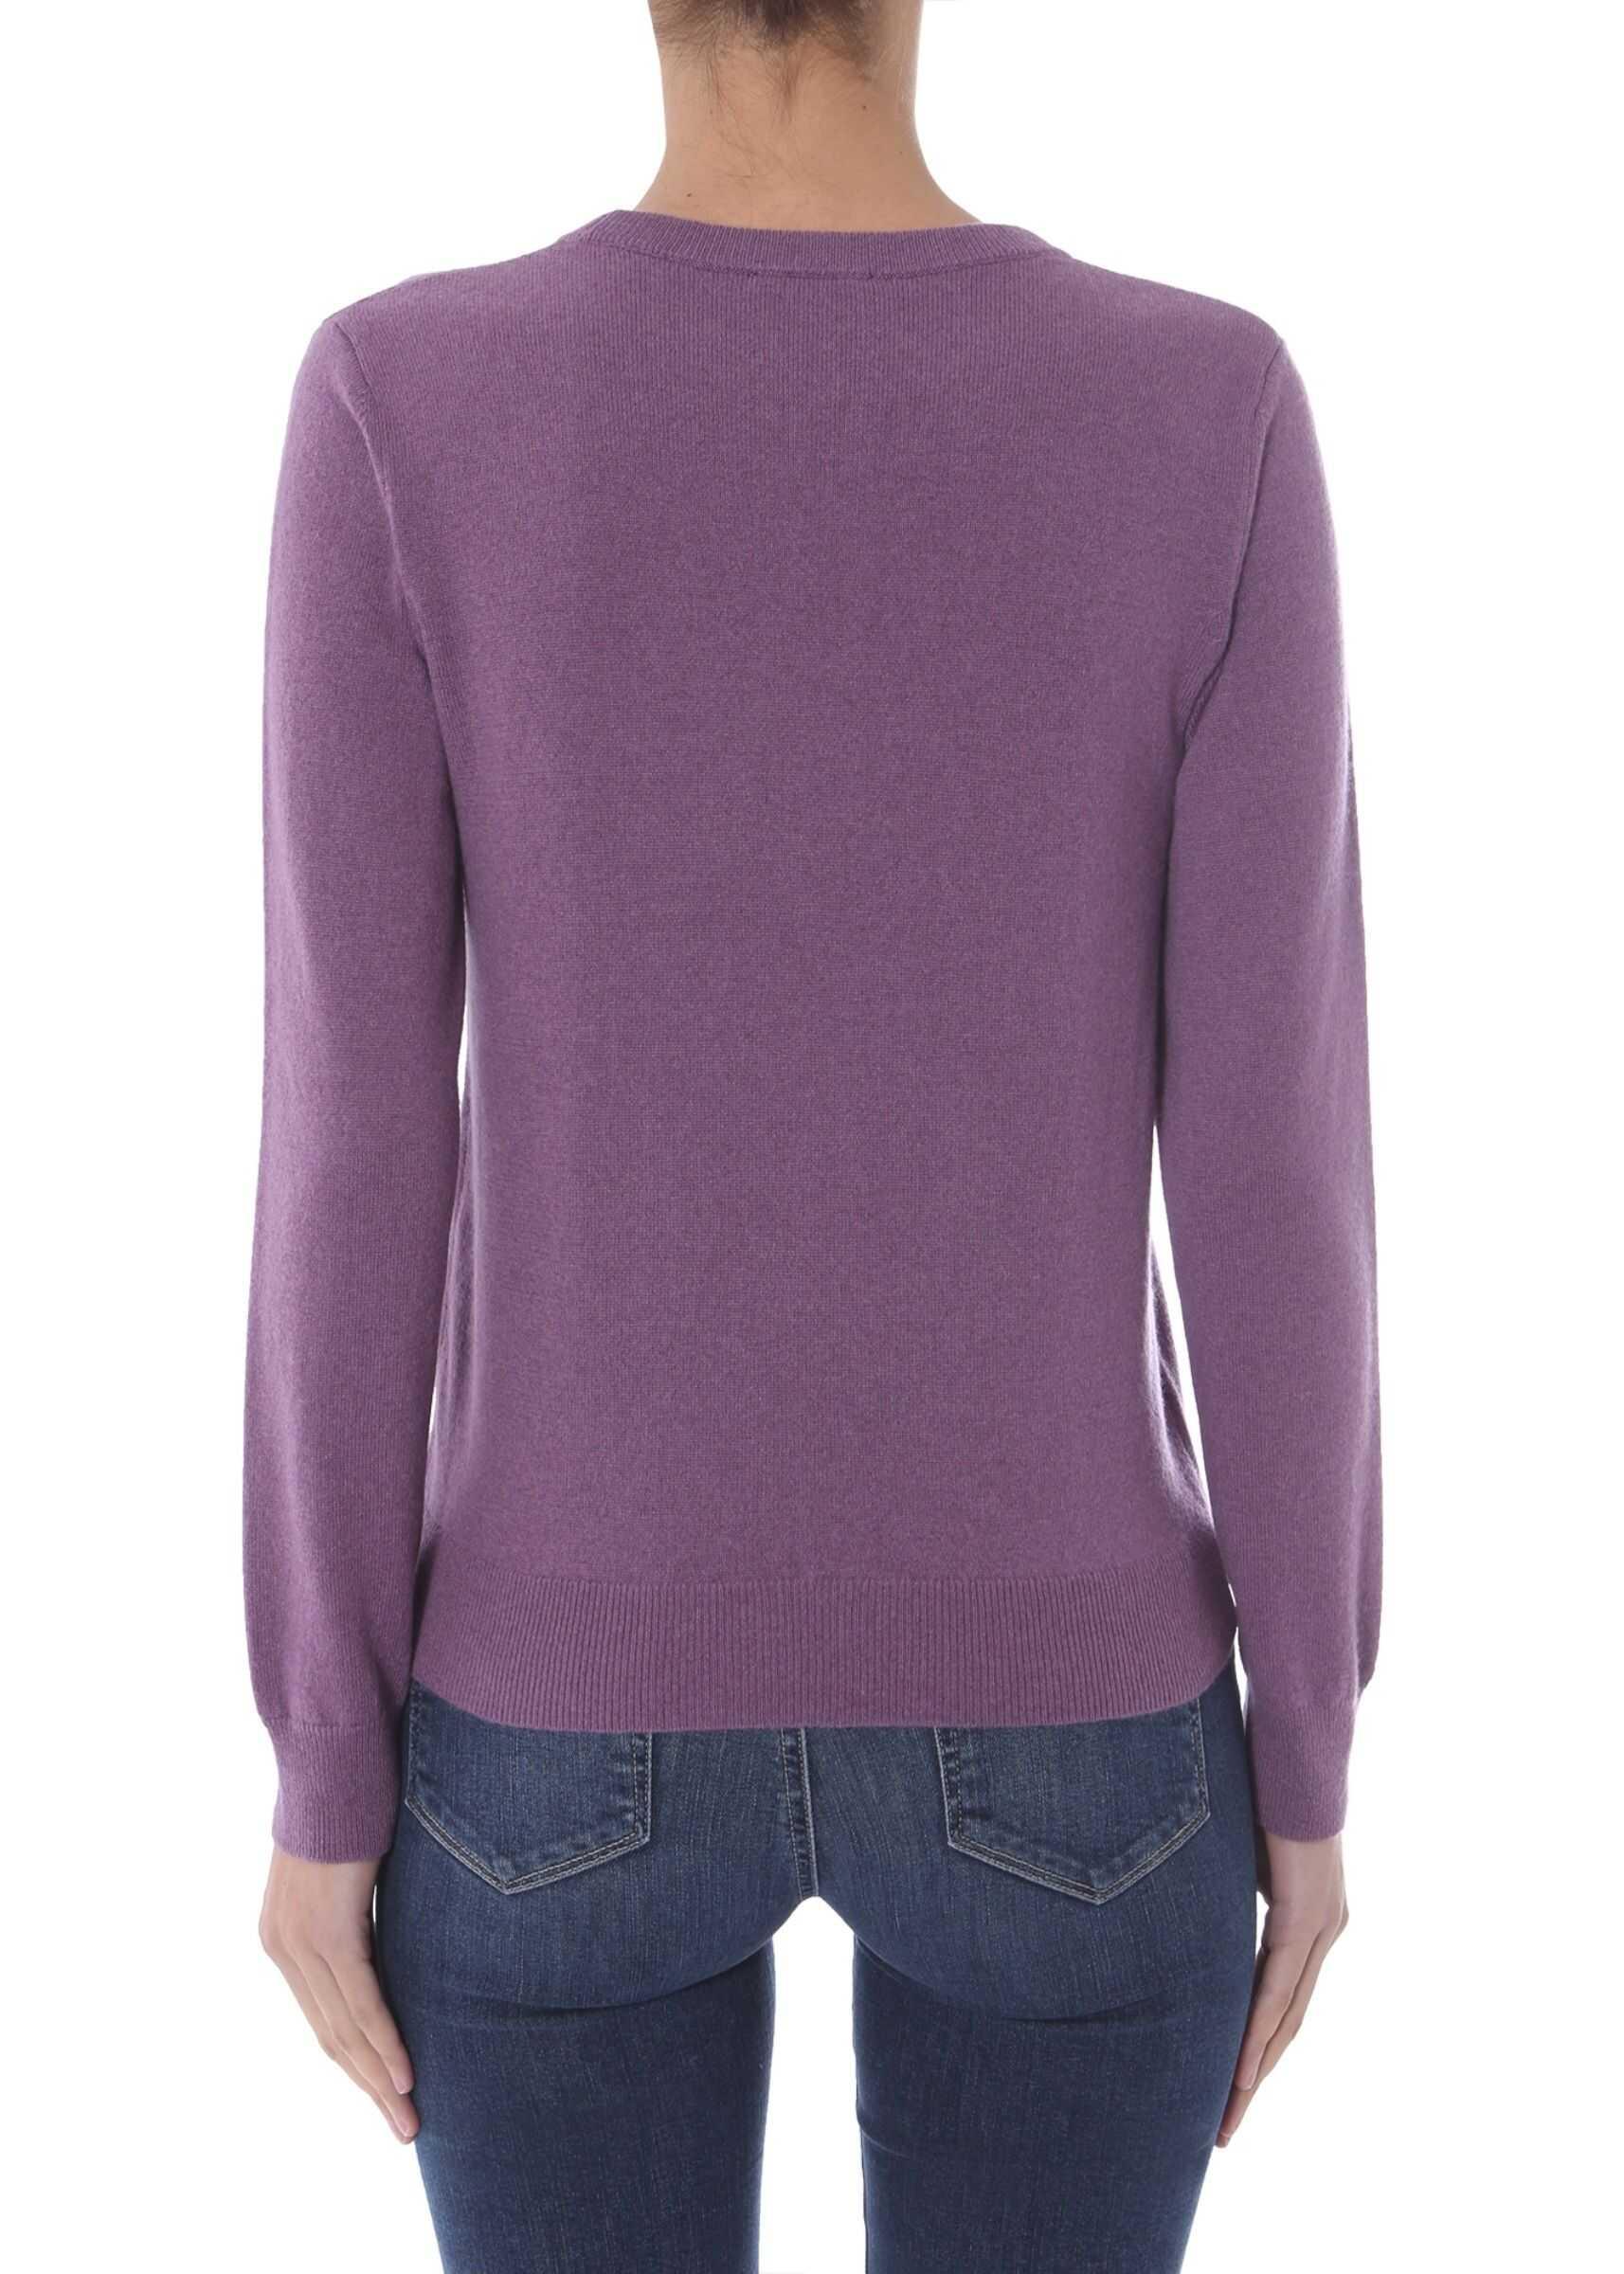 A.P.C. Crew Neck Sweater LILAC